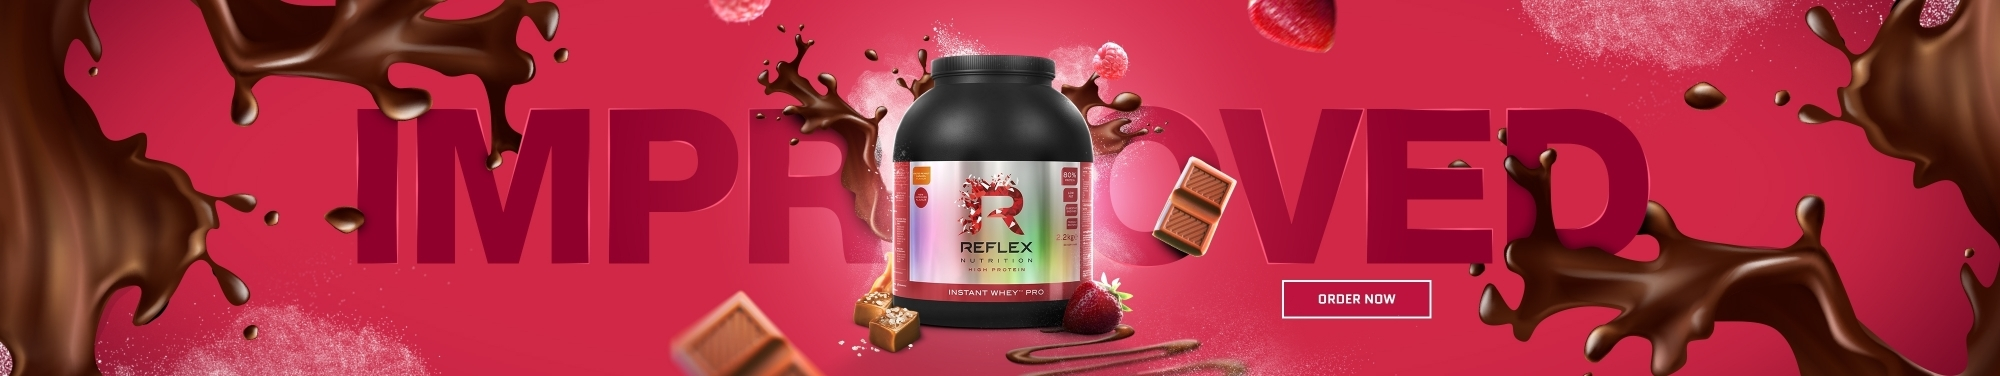 Reflex IWP New & Improved